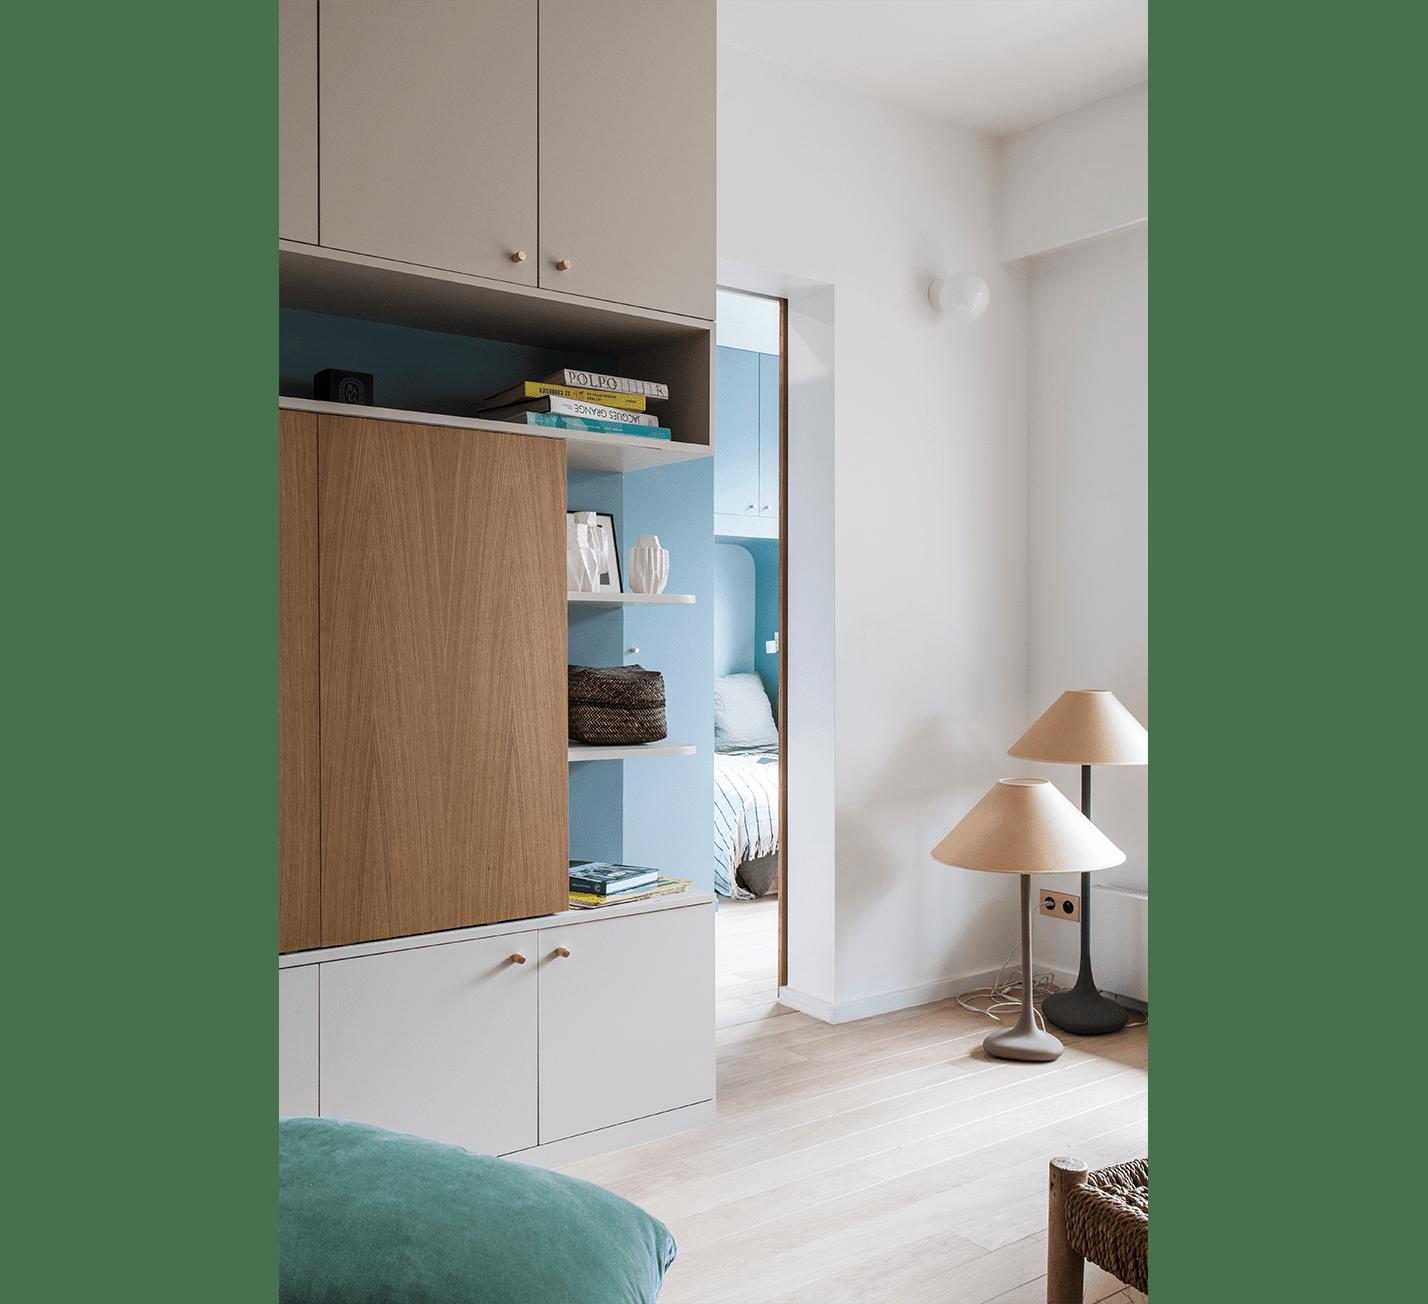 Projet-Albert-Atelier-Steve-Pauline-Borgia-Architecte-interieur-14-min-1